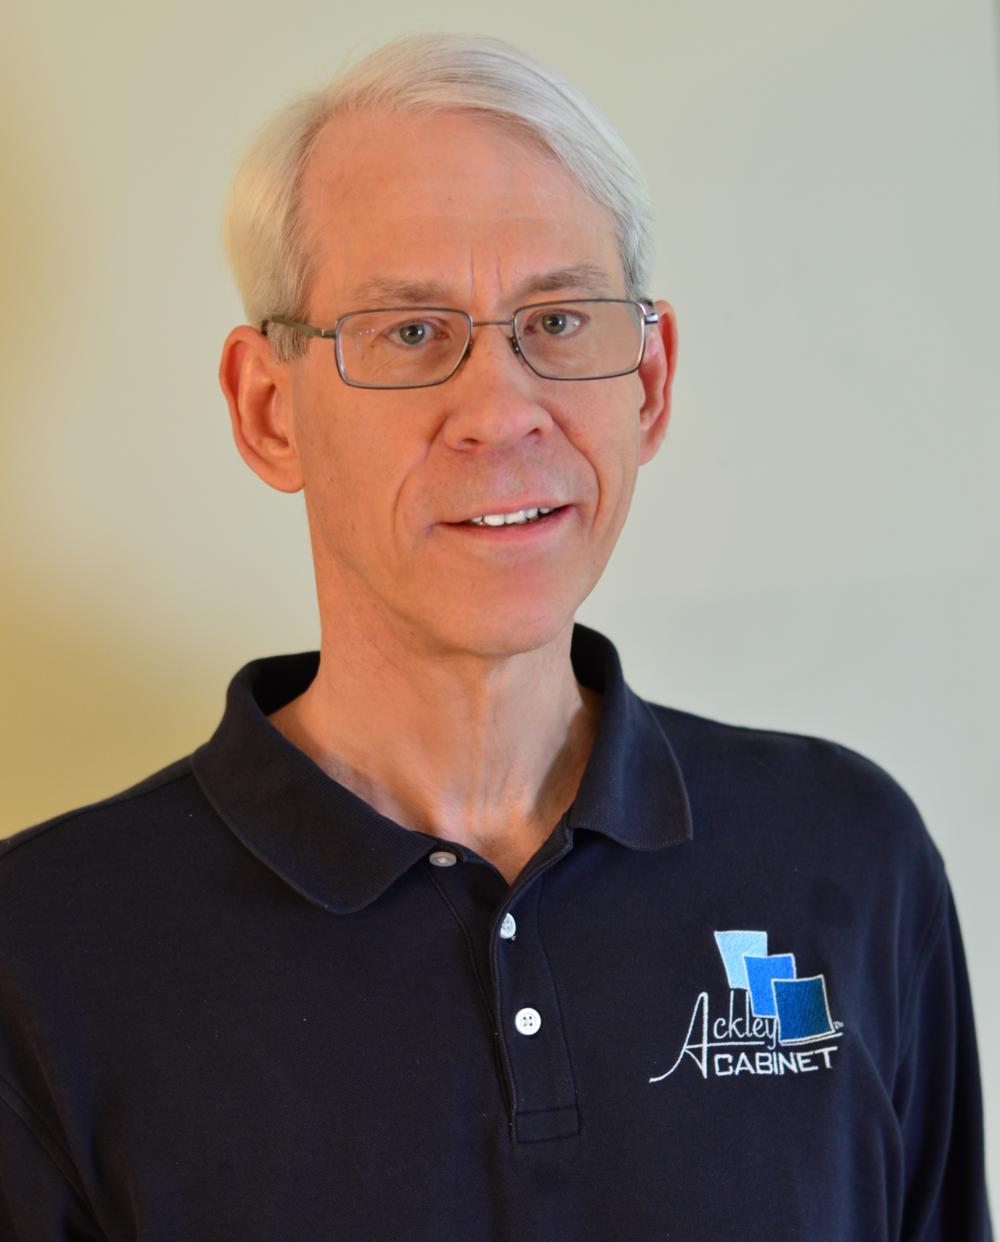 Greg Ackley - Ackley Cabinet LLC